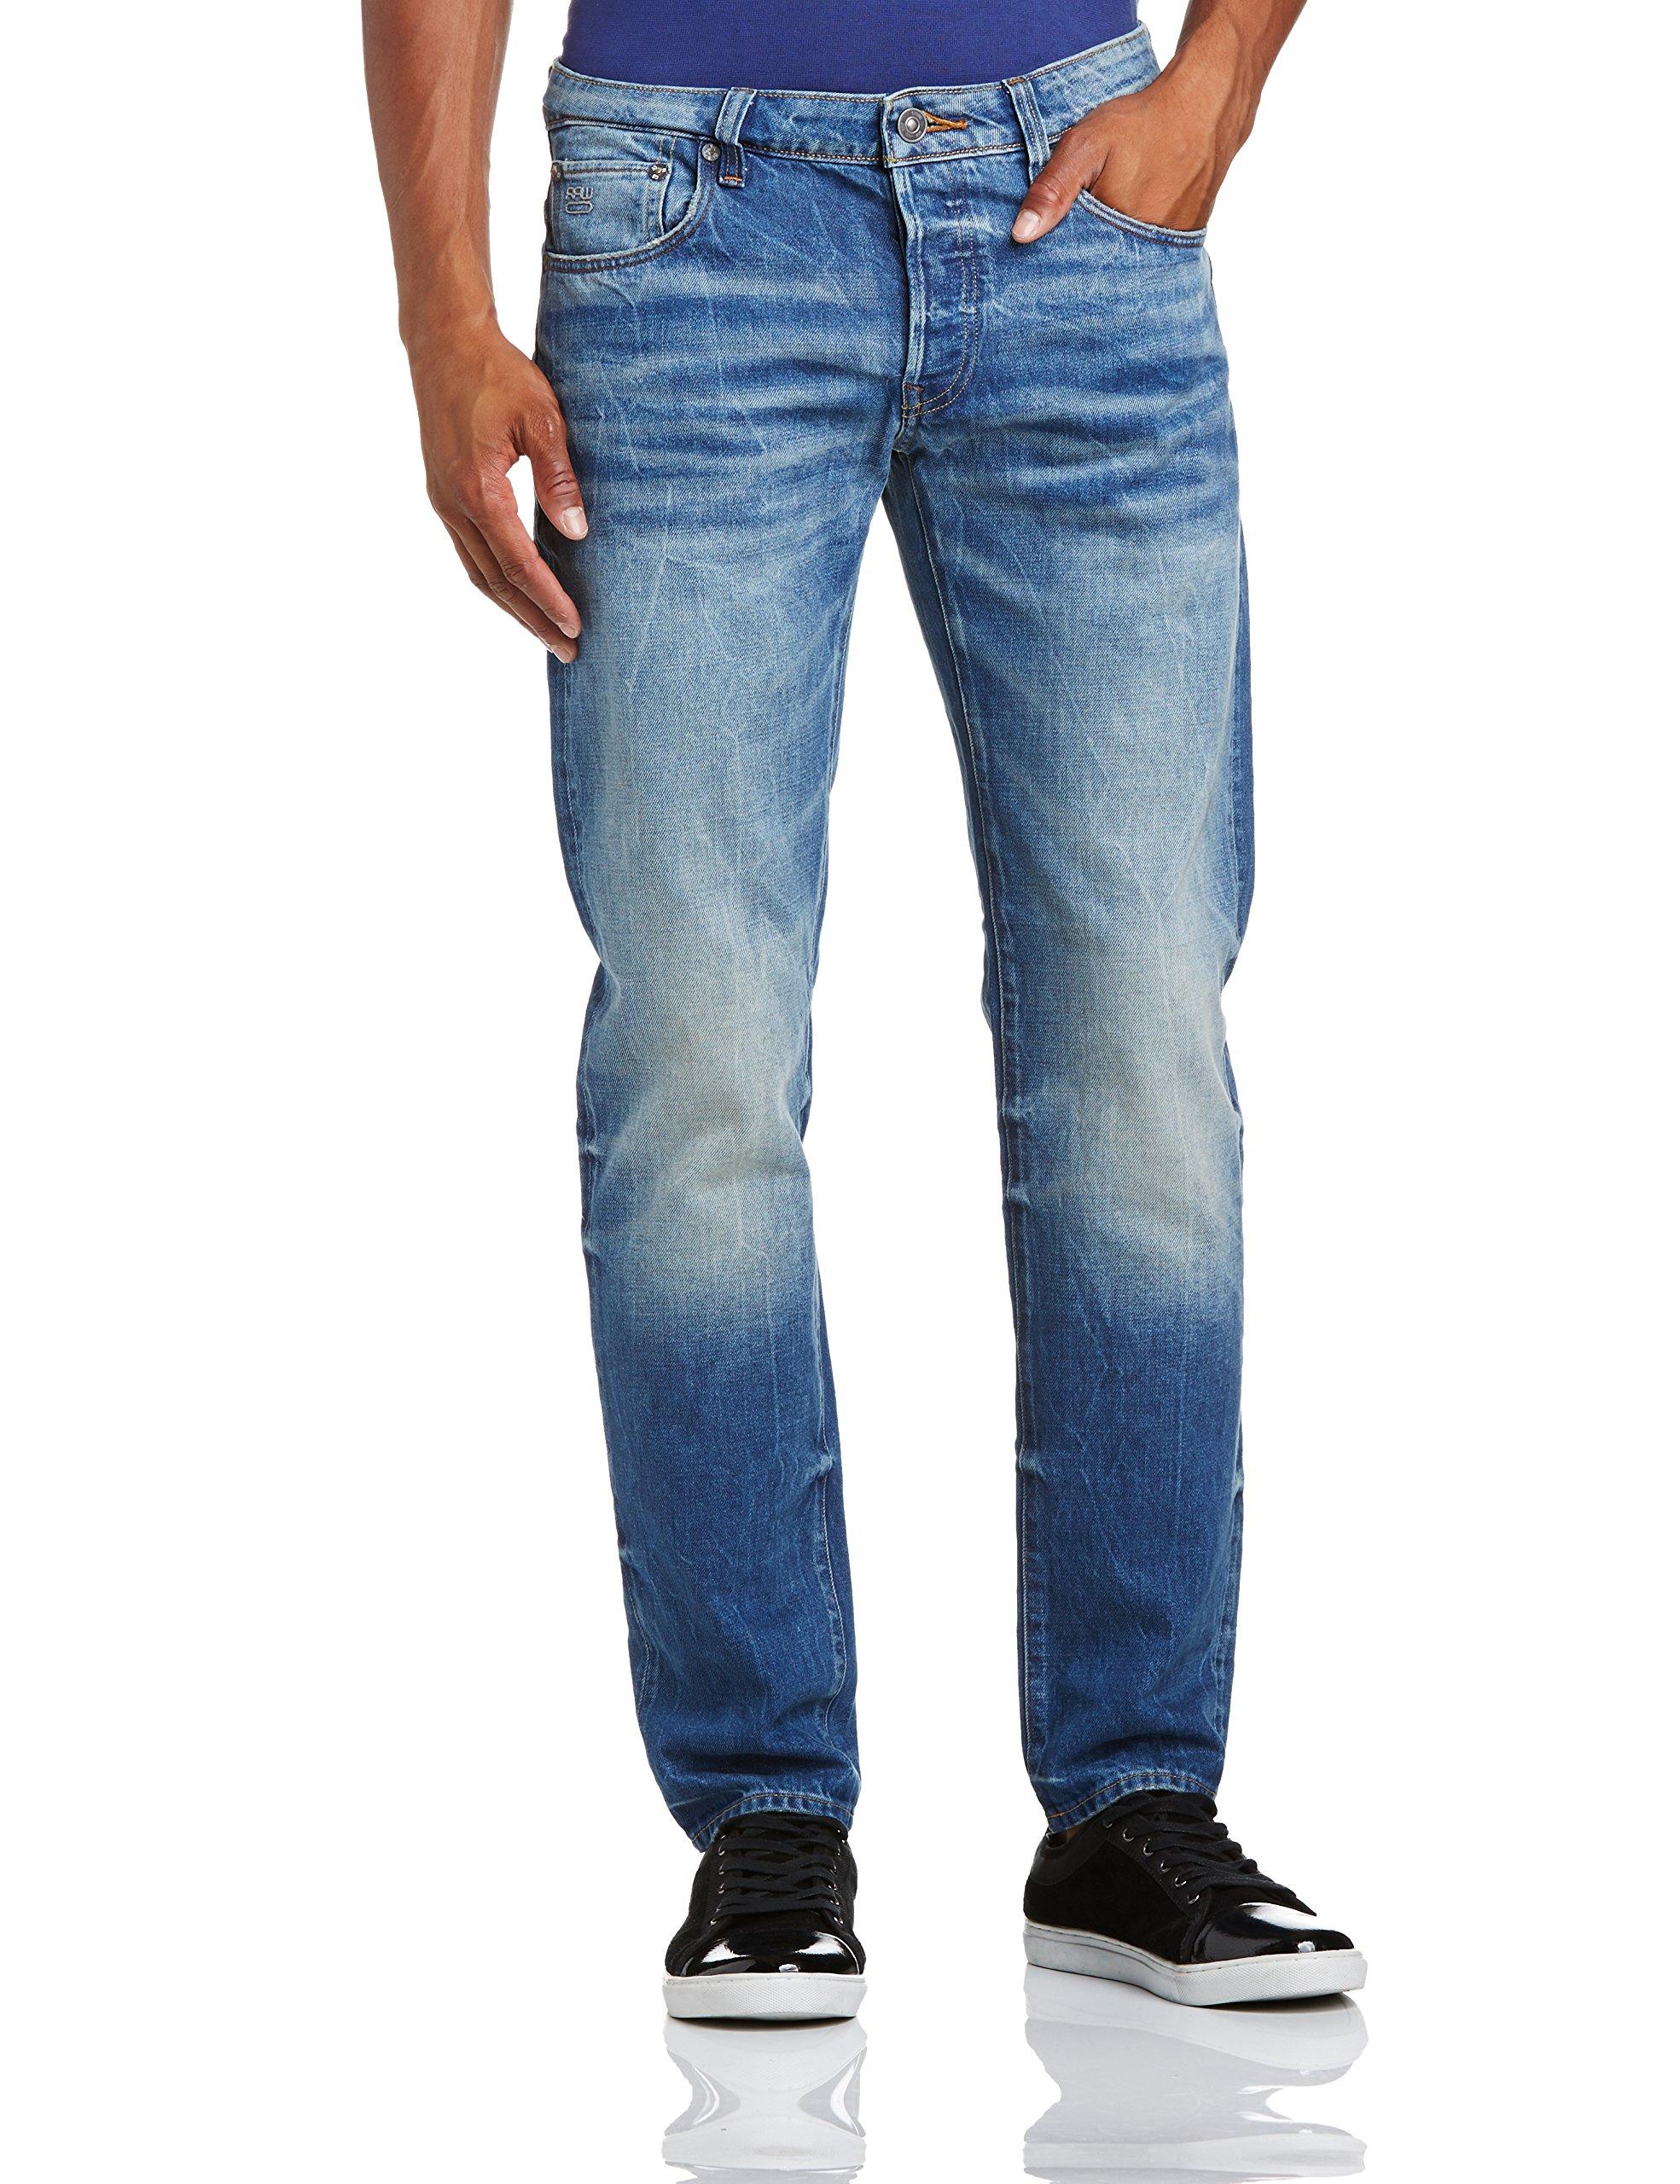 Low Homme 3301 07134w34l 6111 Bleumedium Jeans Raw Tapered star Aged G QdshCtr